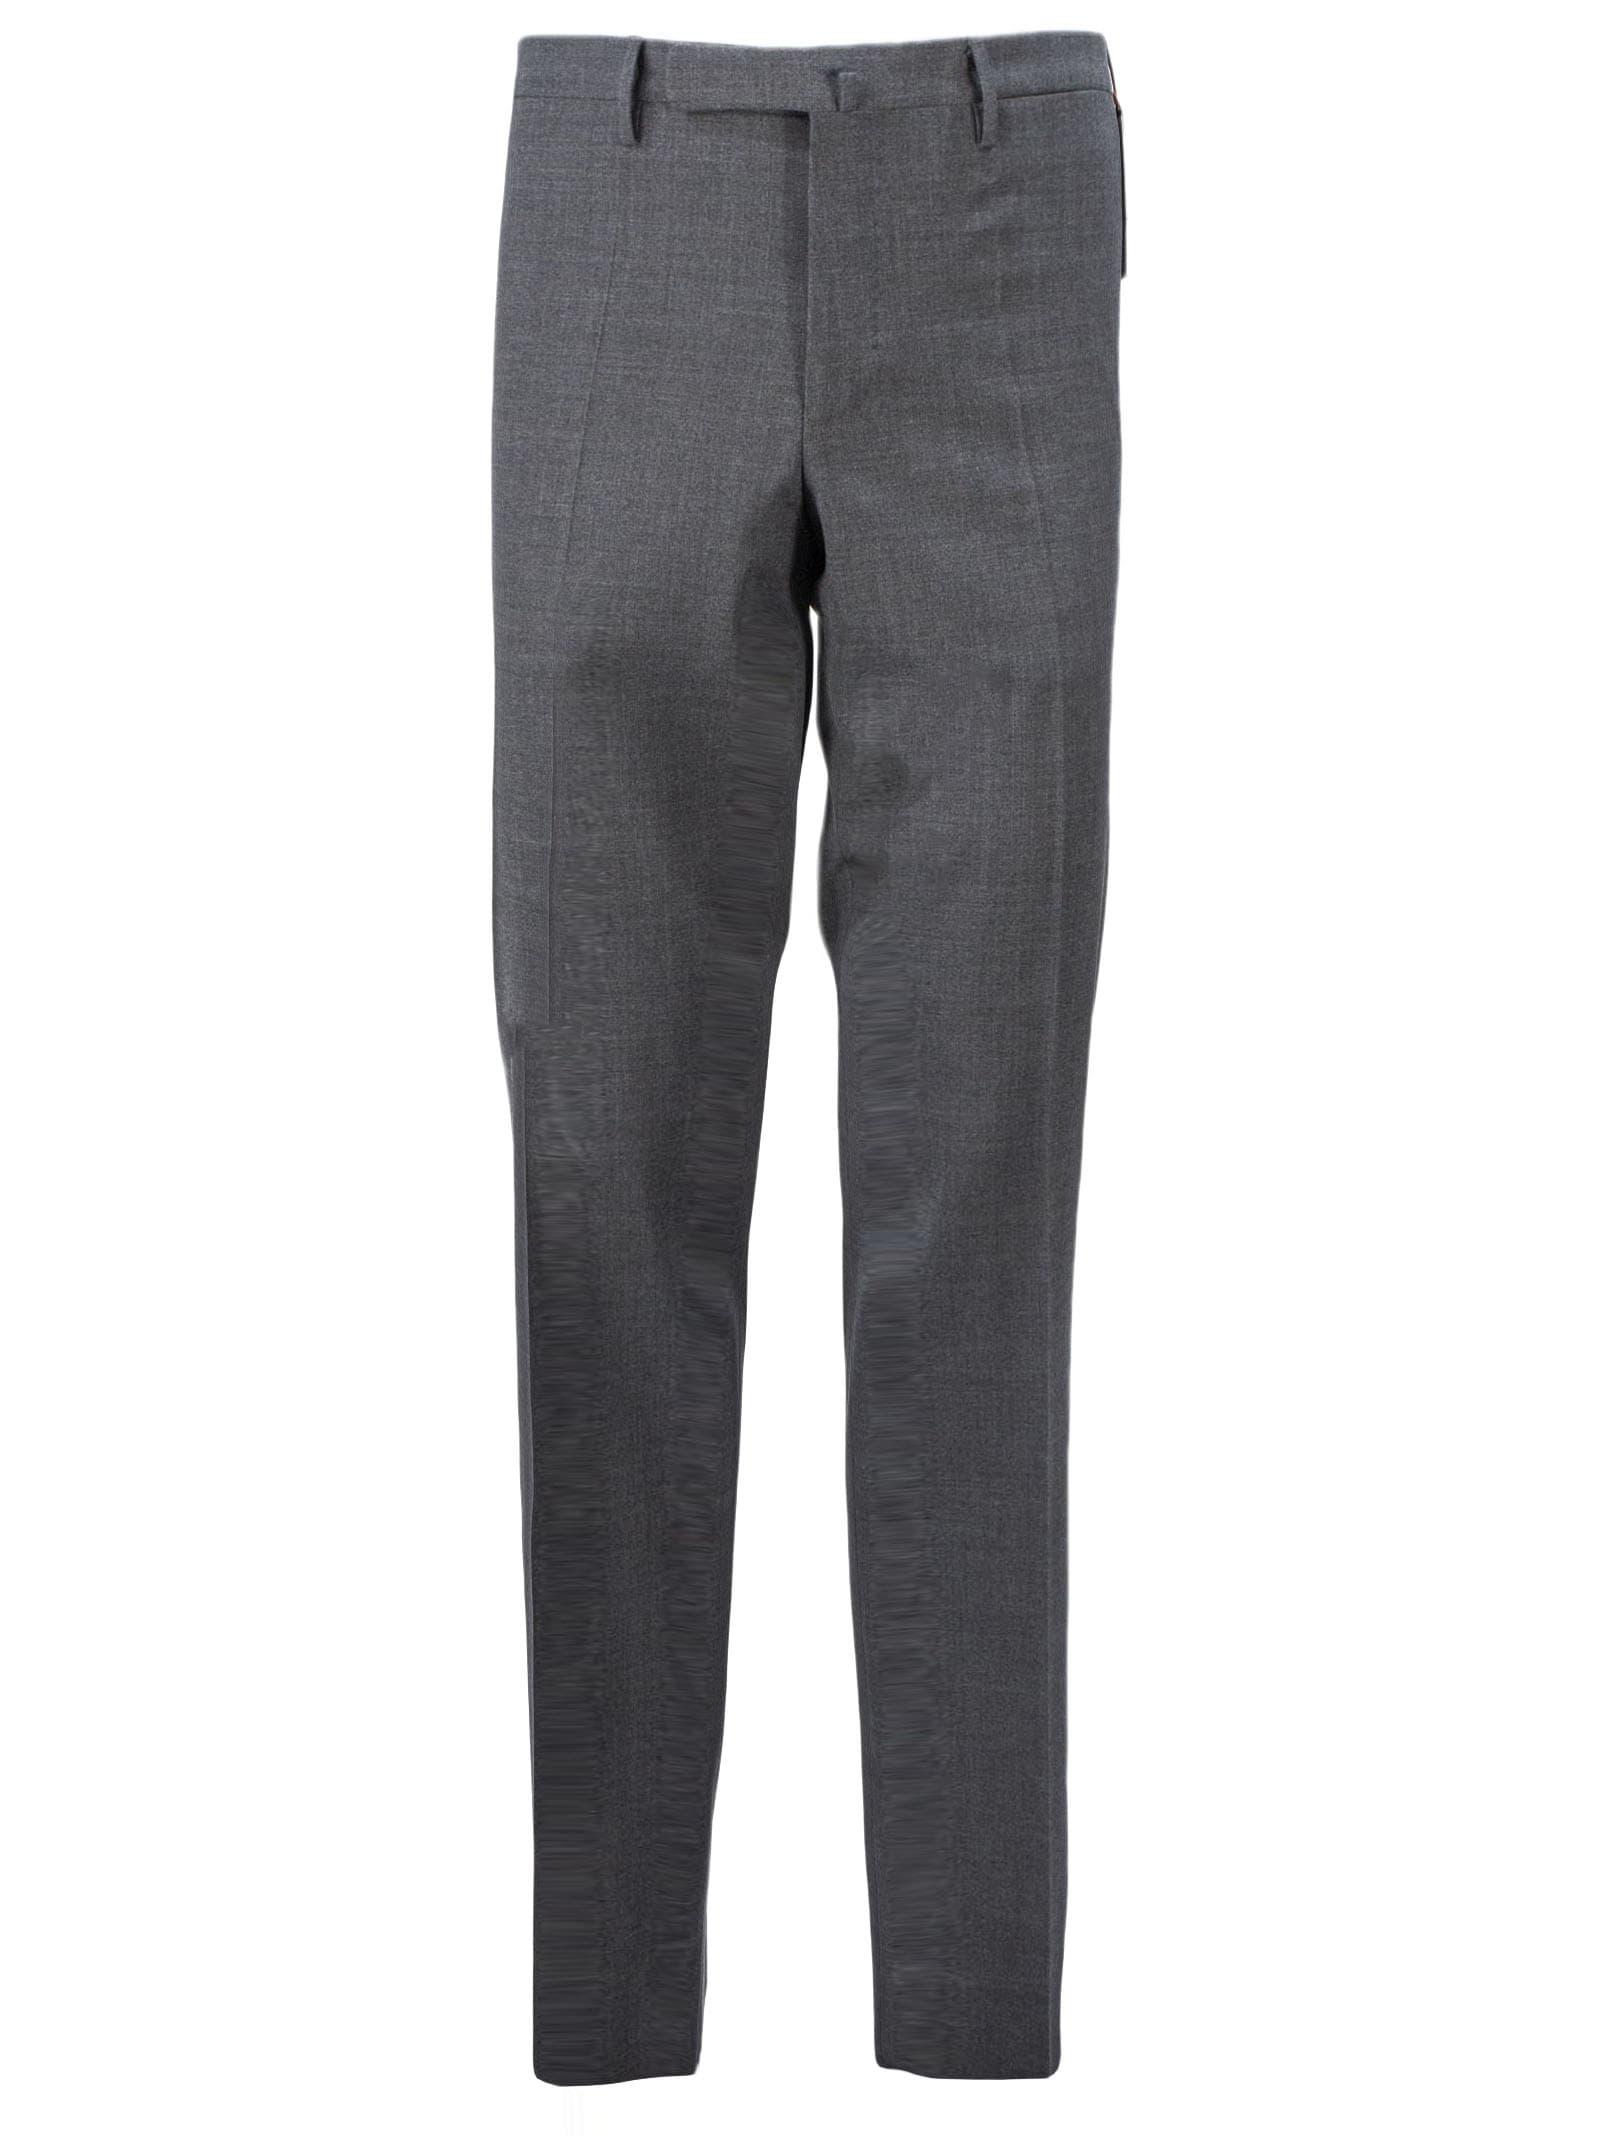 Incotex Grey Wool Blend Trousers